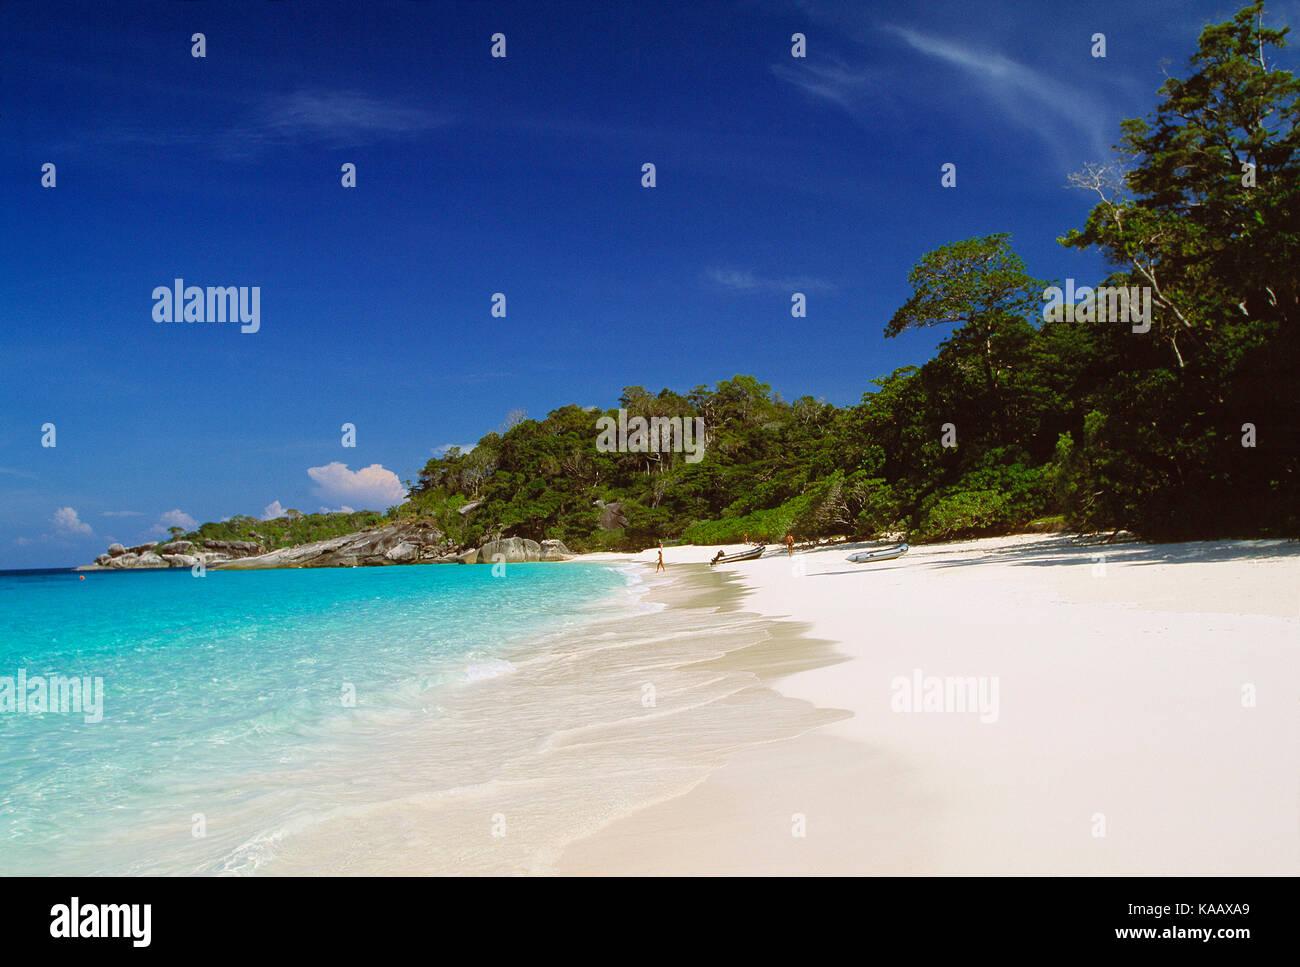 Thailand. Similan Islands. Beach. - Stock Image